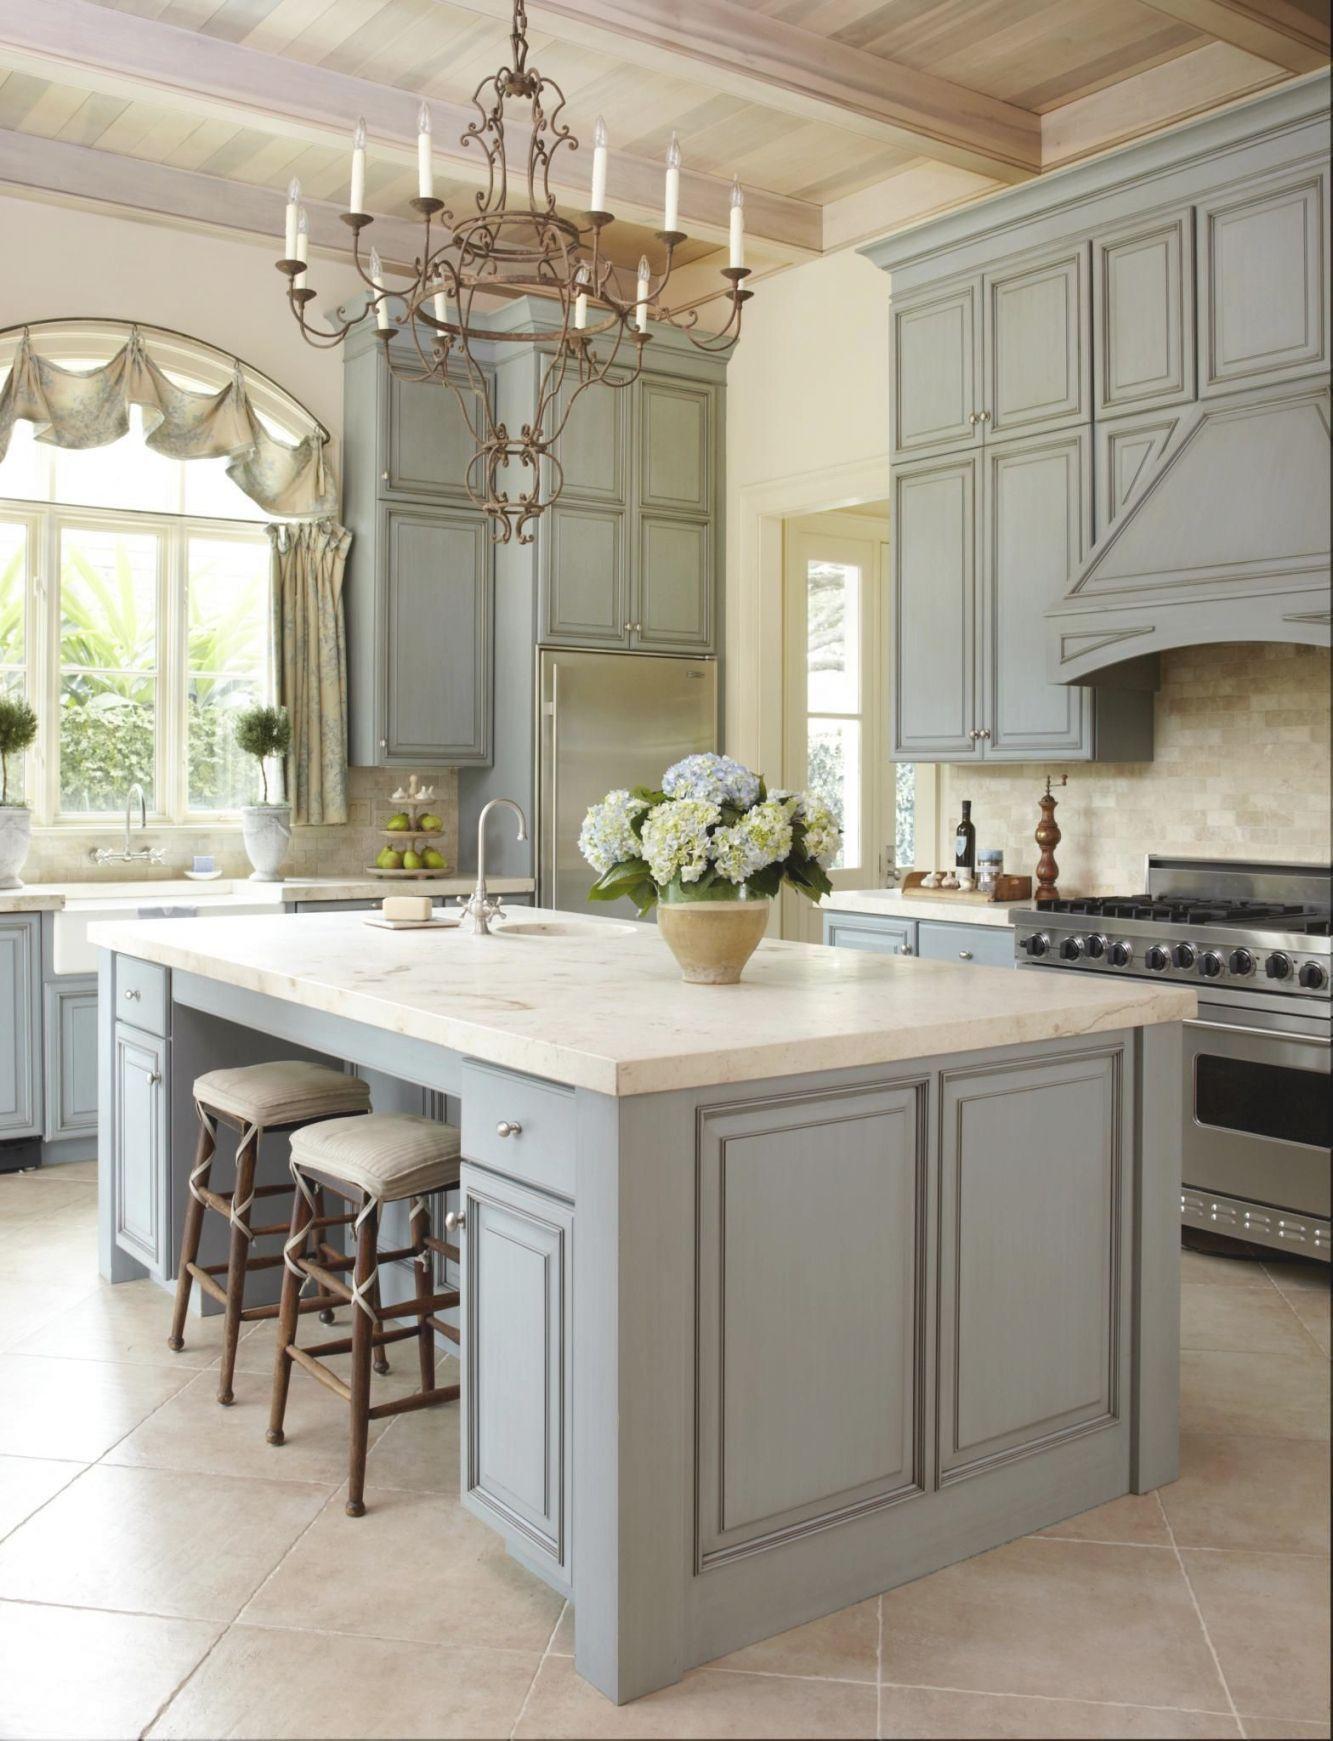 French Blue Kitchen Cabinets Festivalmontmelas Kitchen Cabinet Kitchens Blue Ca Country Chic Kitchen French Country Kitchens Country Style Kitchen